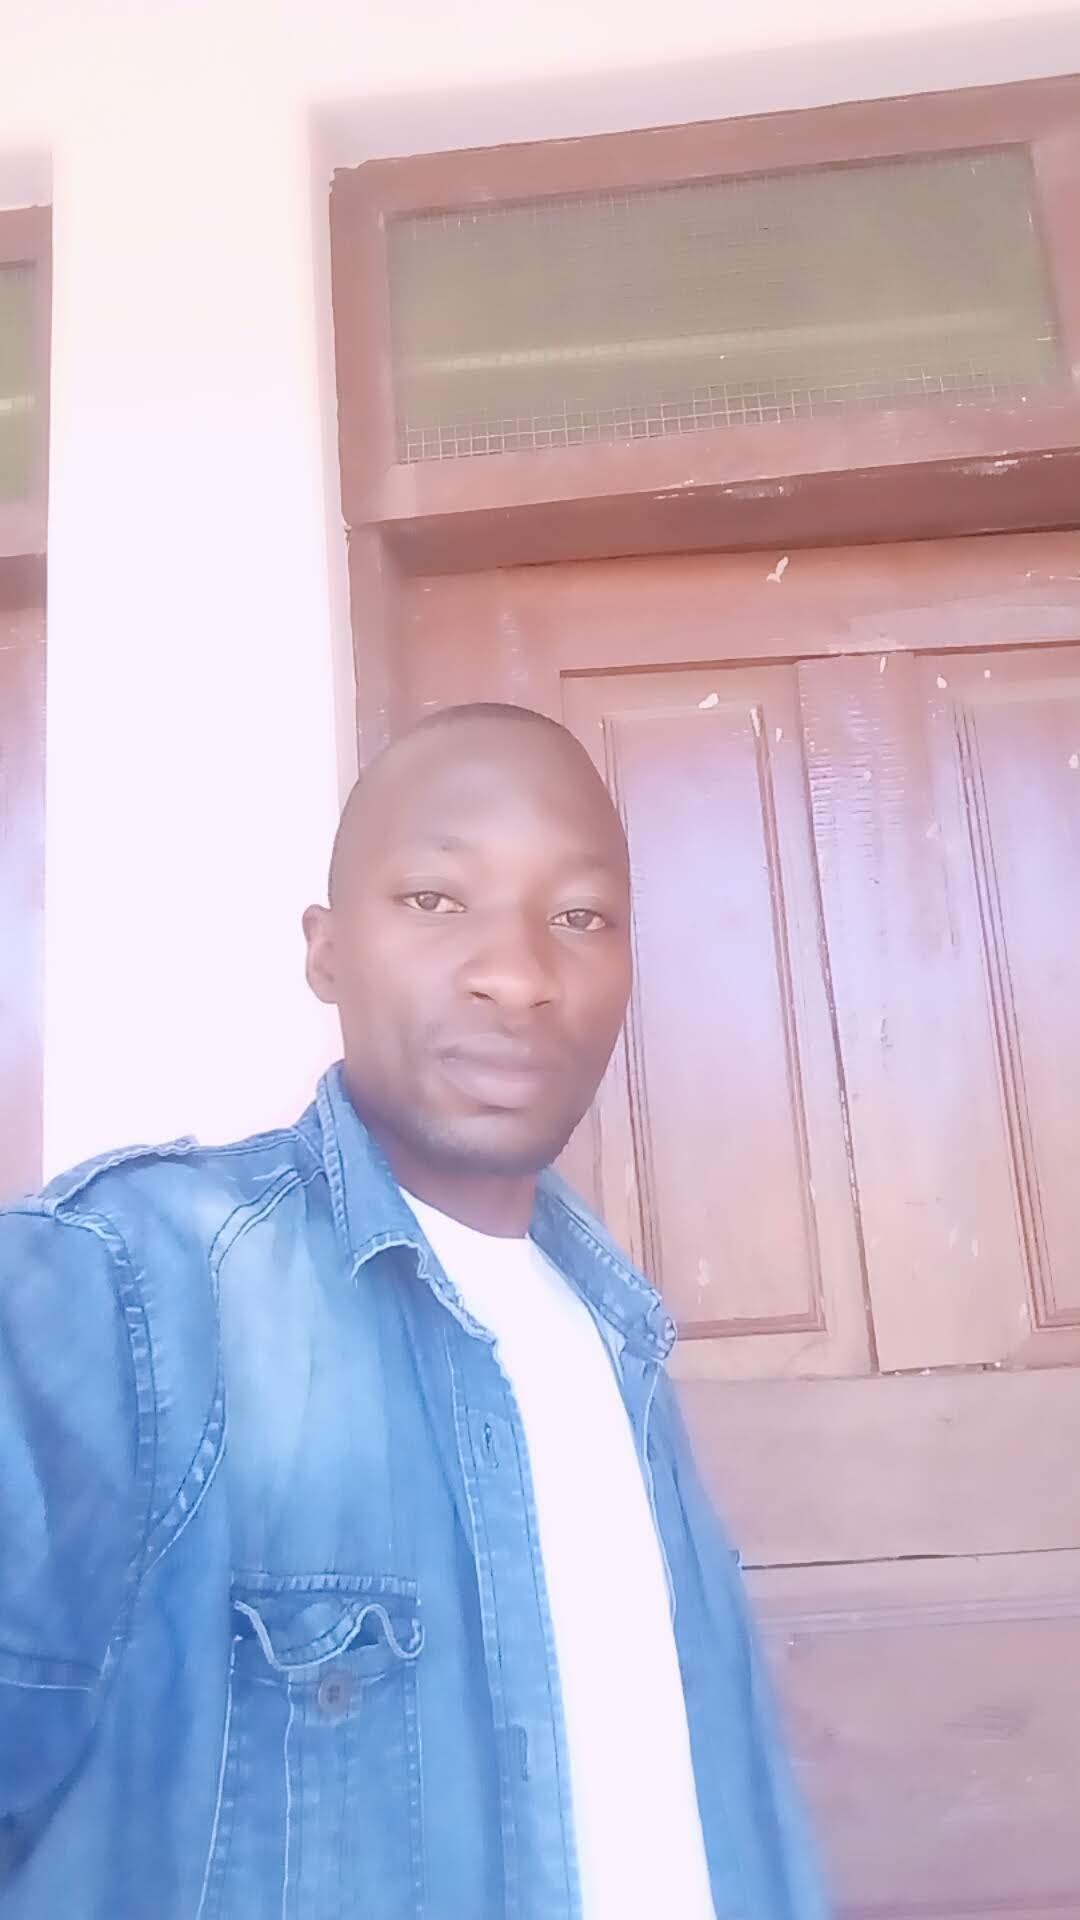 jose wa jose - Ubarikiwe Na Bwana